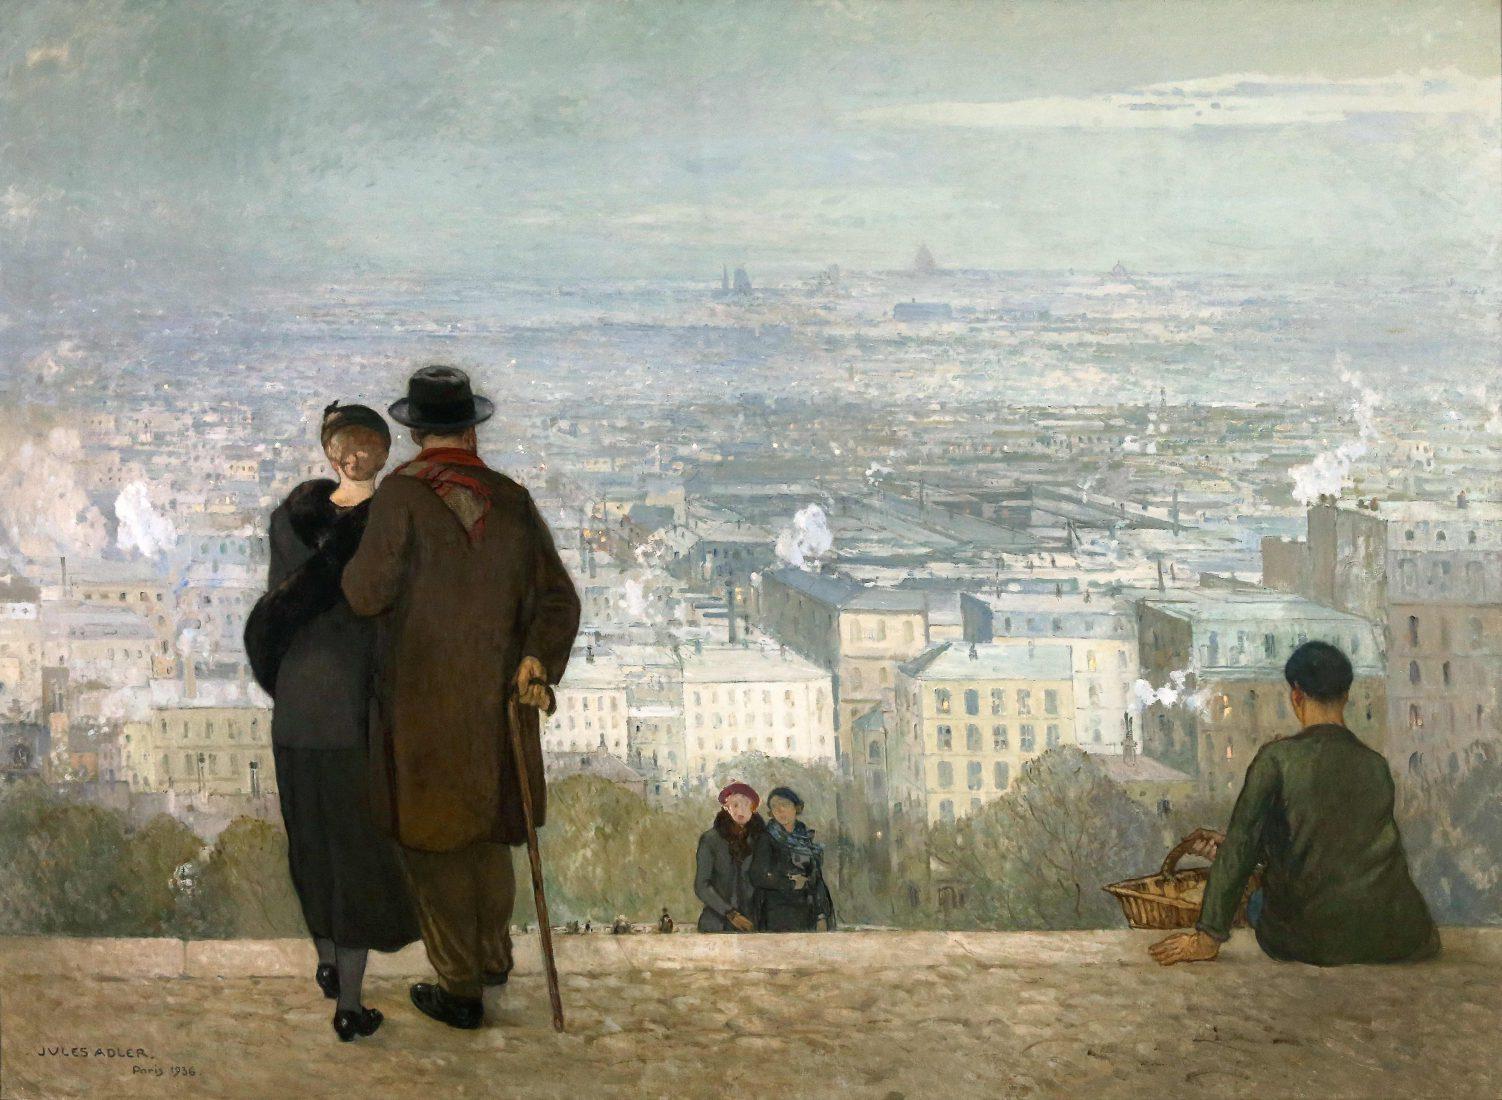 Jules Adler Musee Dole_Sacre-Coeur_cl. H.Bertand © ADAGP